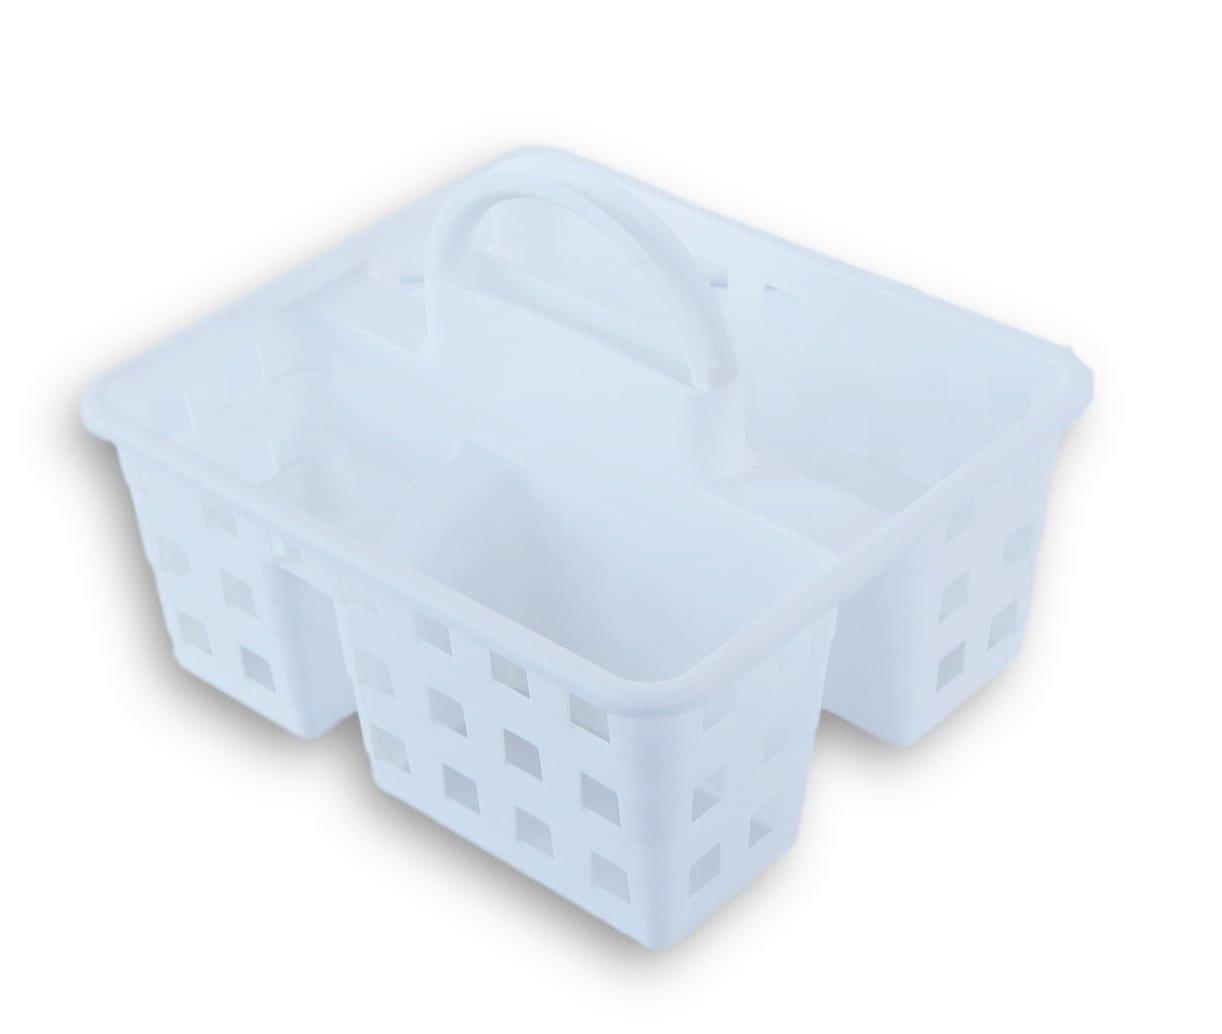 Amazon.com: Small Utility Shower Caddy Tote - White: Home & Kitchen